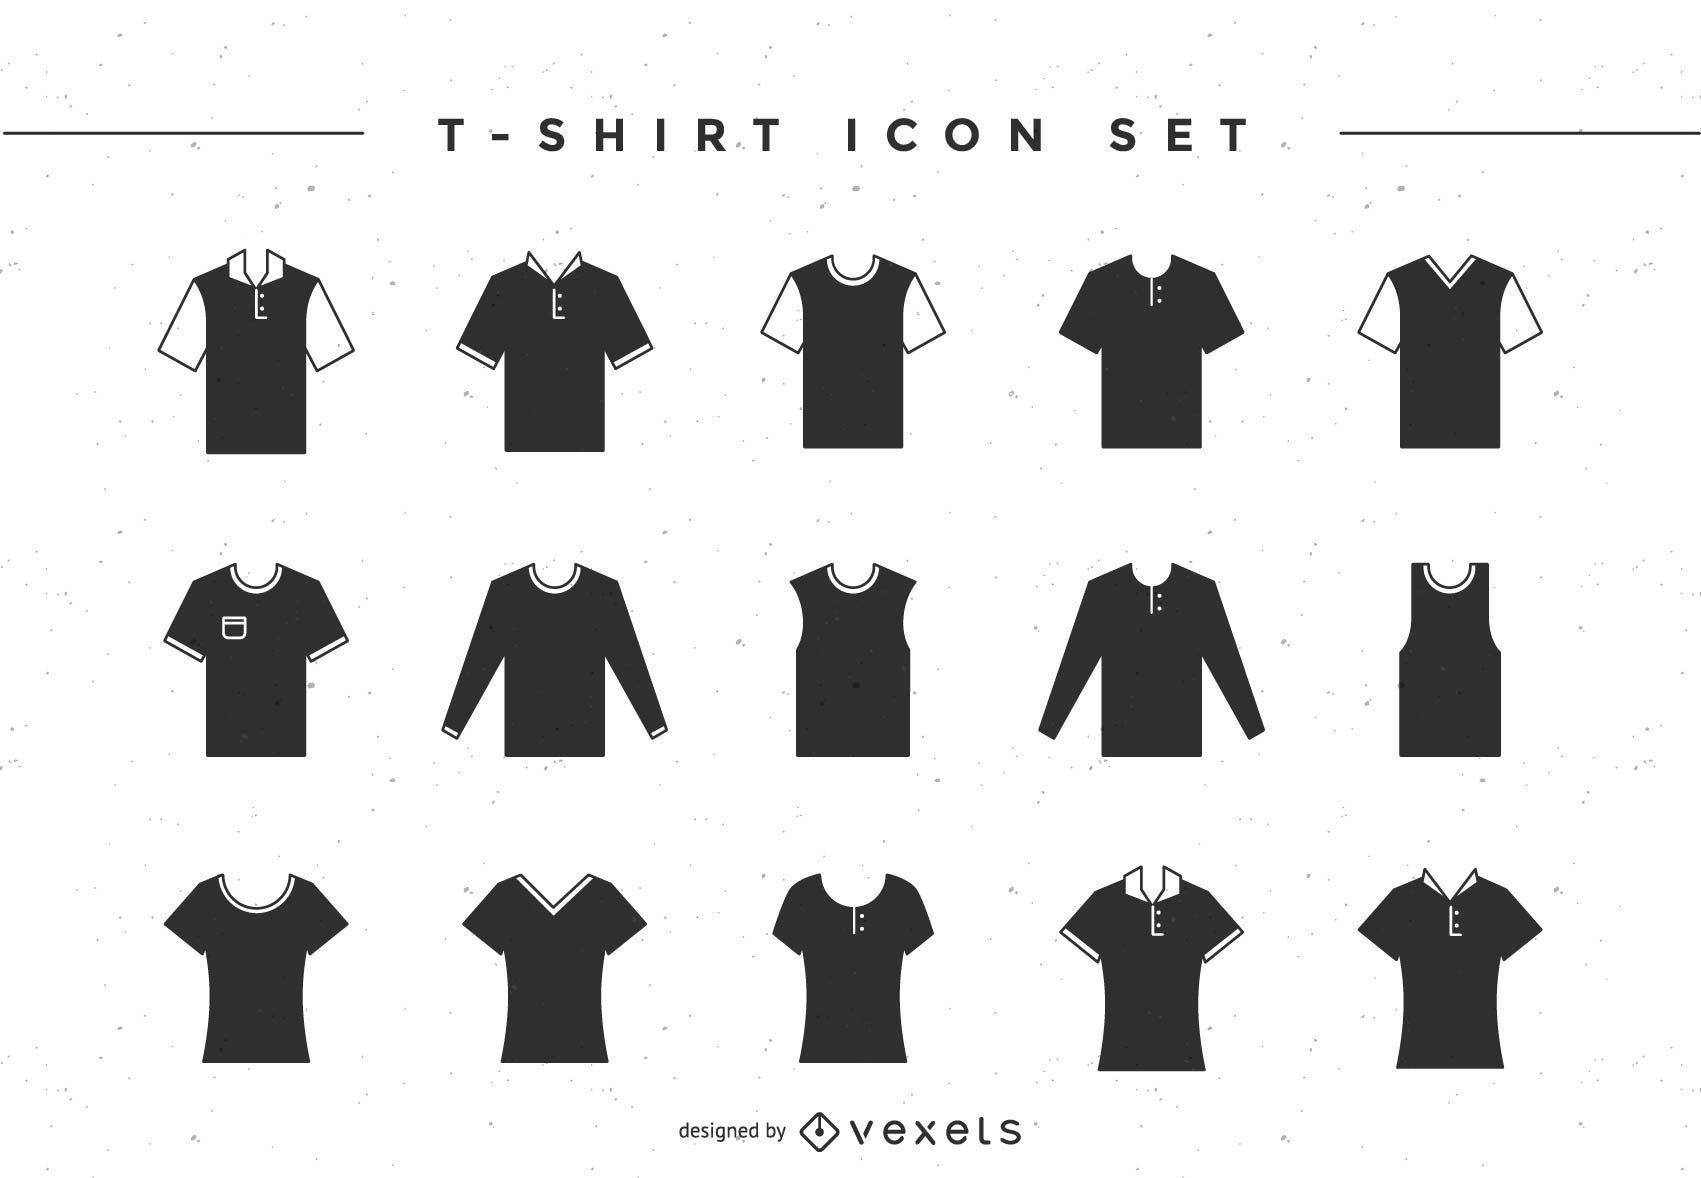 T-shirt icon set